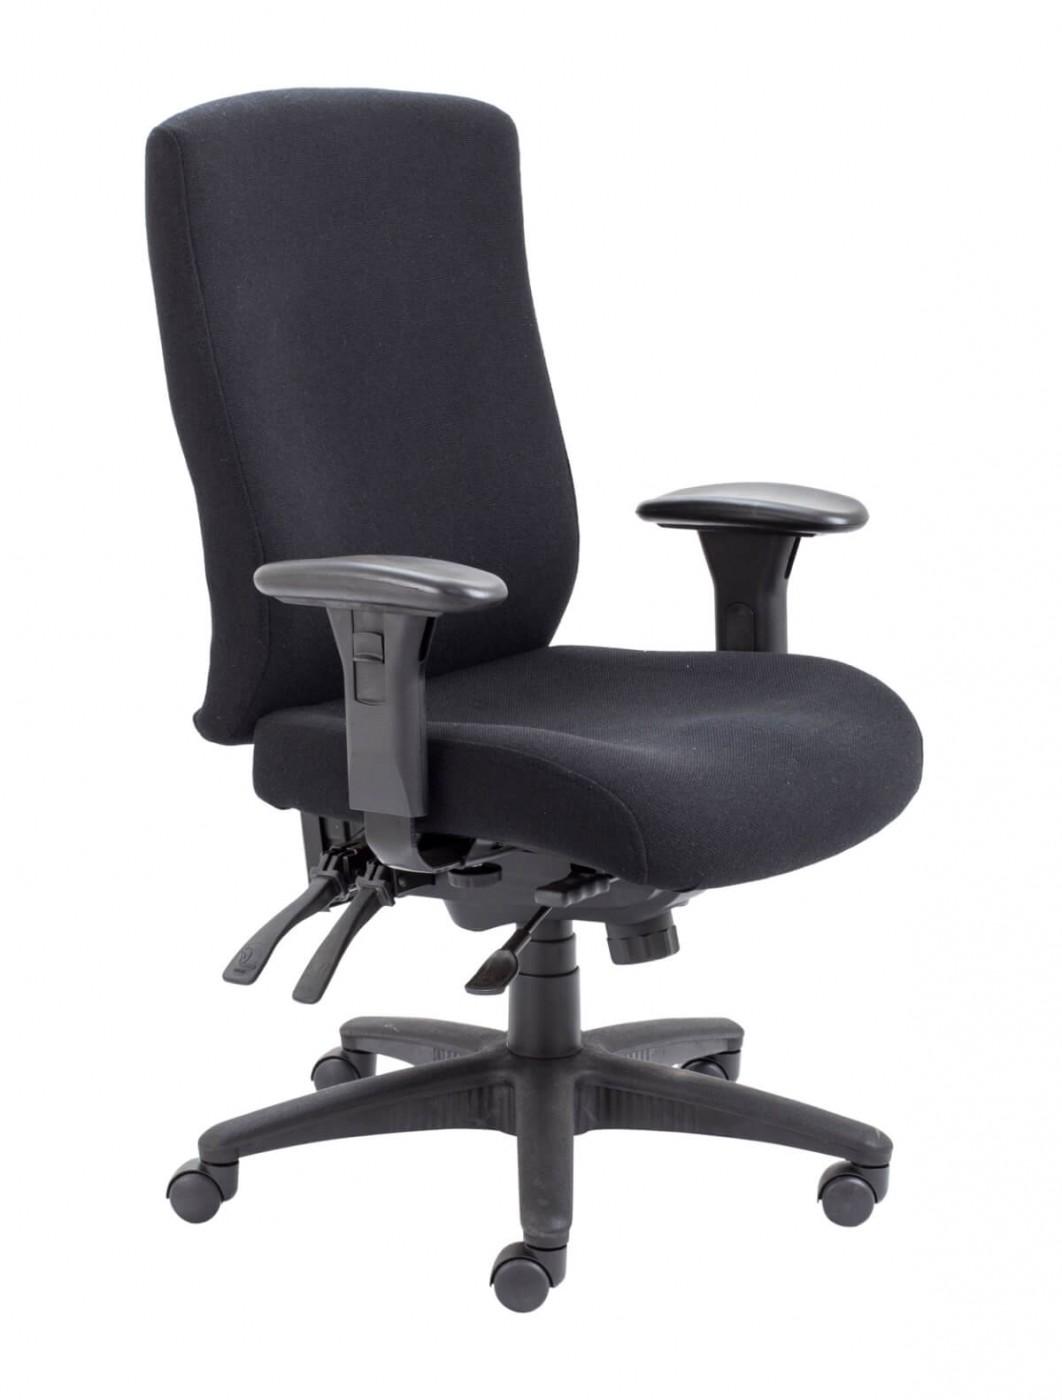 office chairs marathon heavy duty office chair ch1106bk enlarged view - Heavy Duty Office Chairs